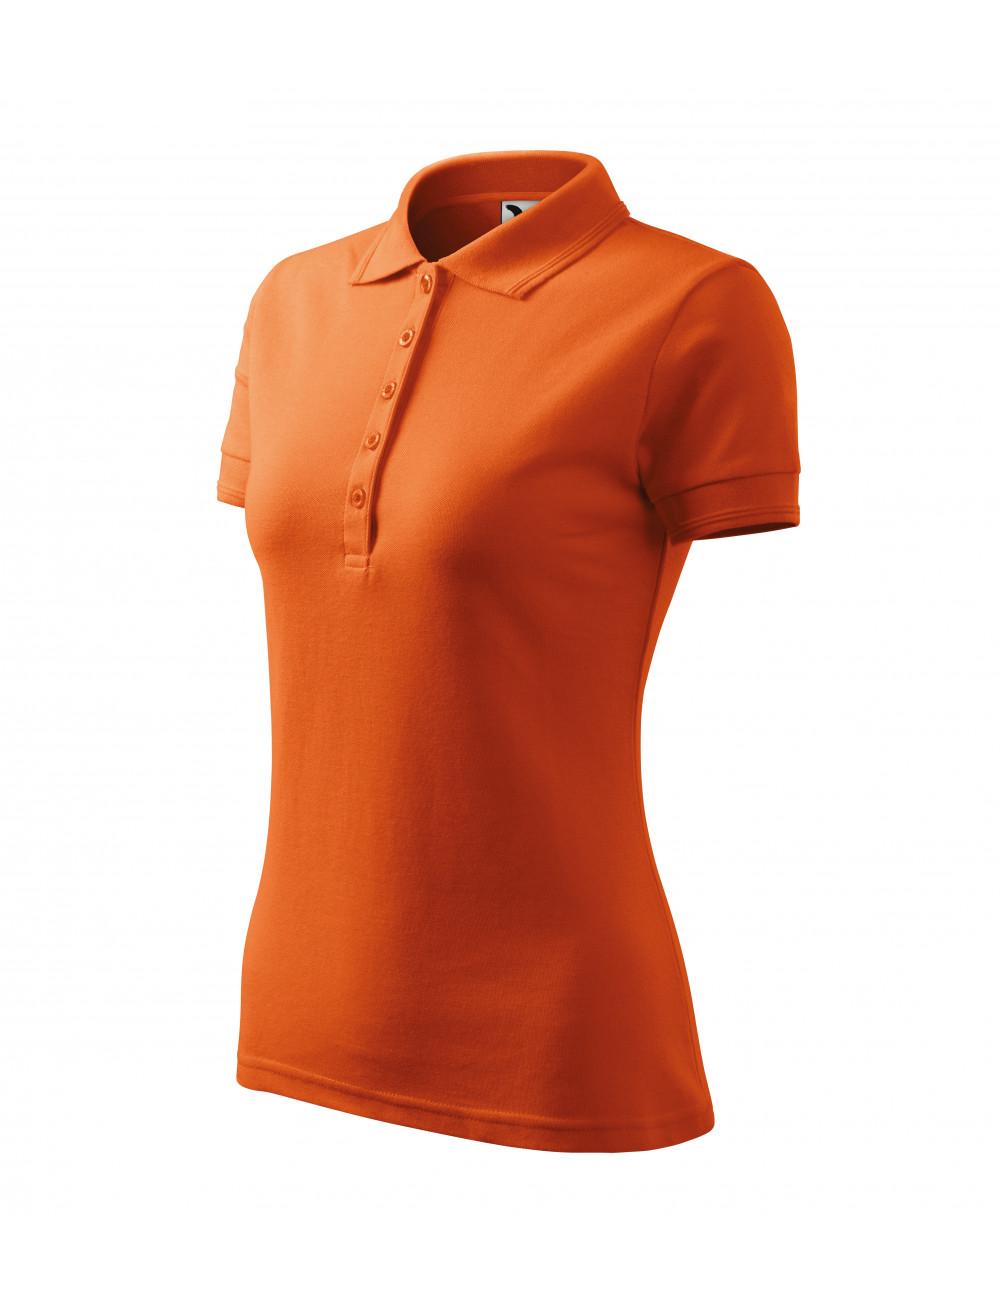 Adler MALFINI Koszulka polo damska Pique Polo 210 pomarańczowy